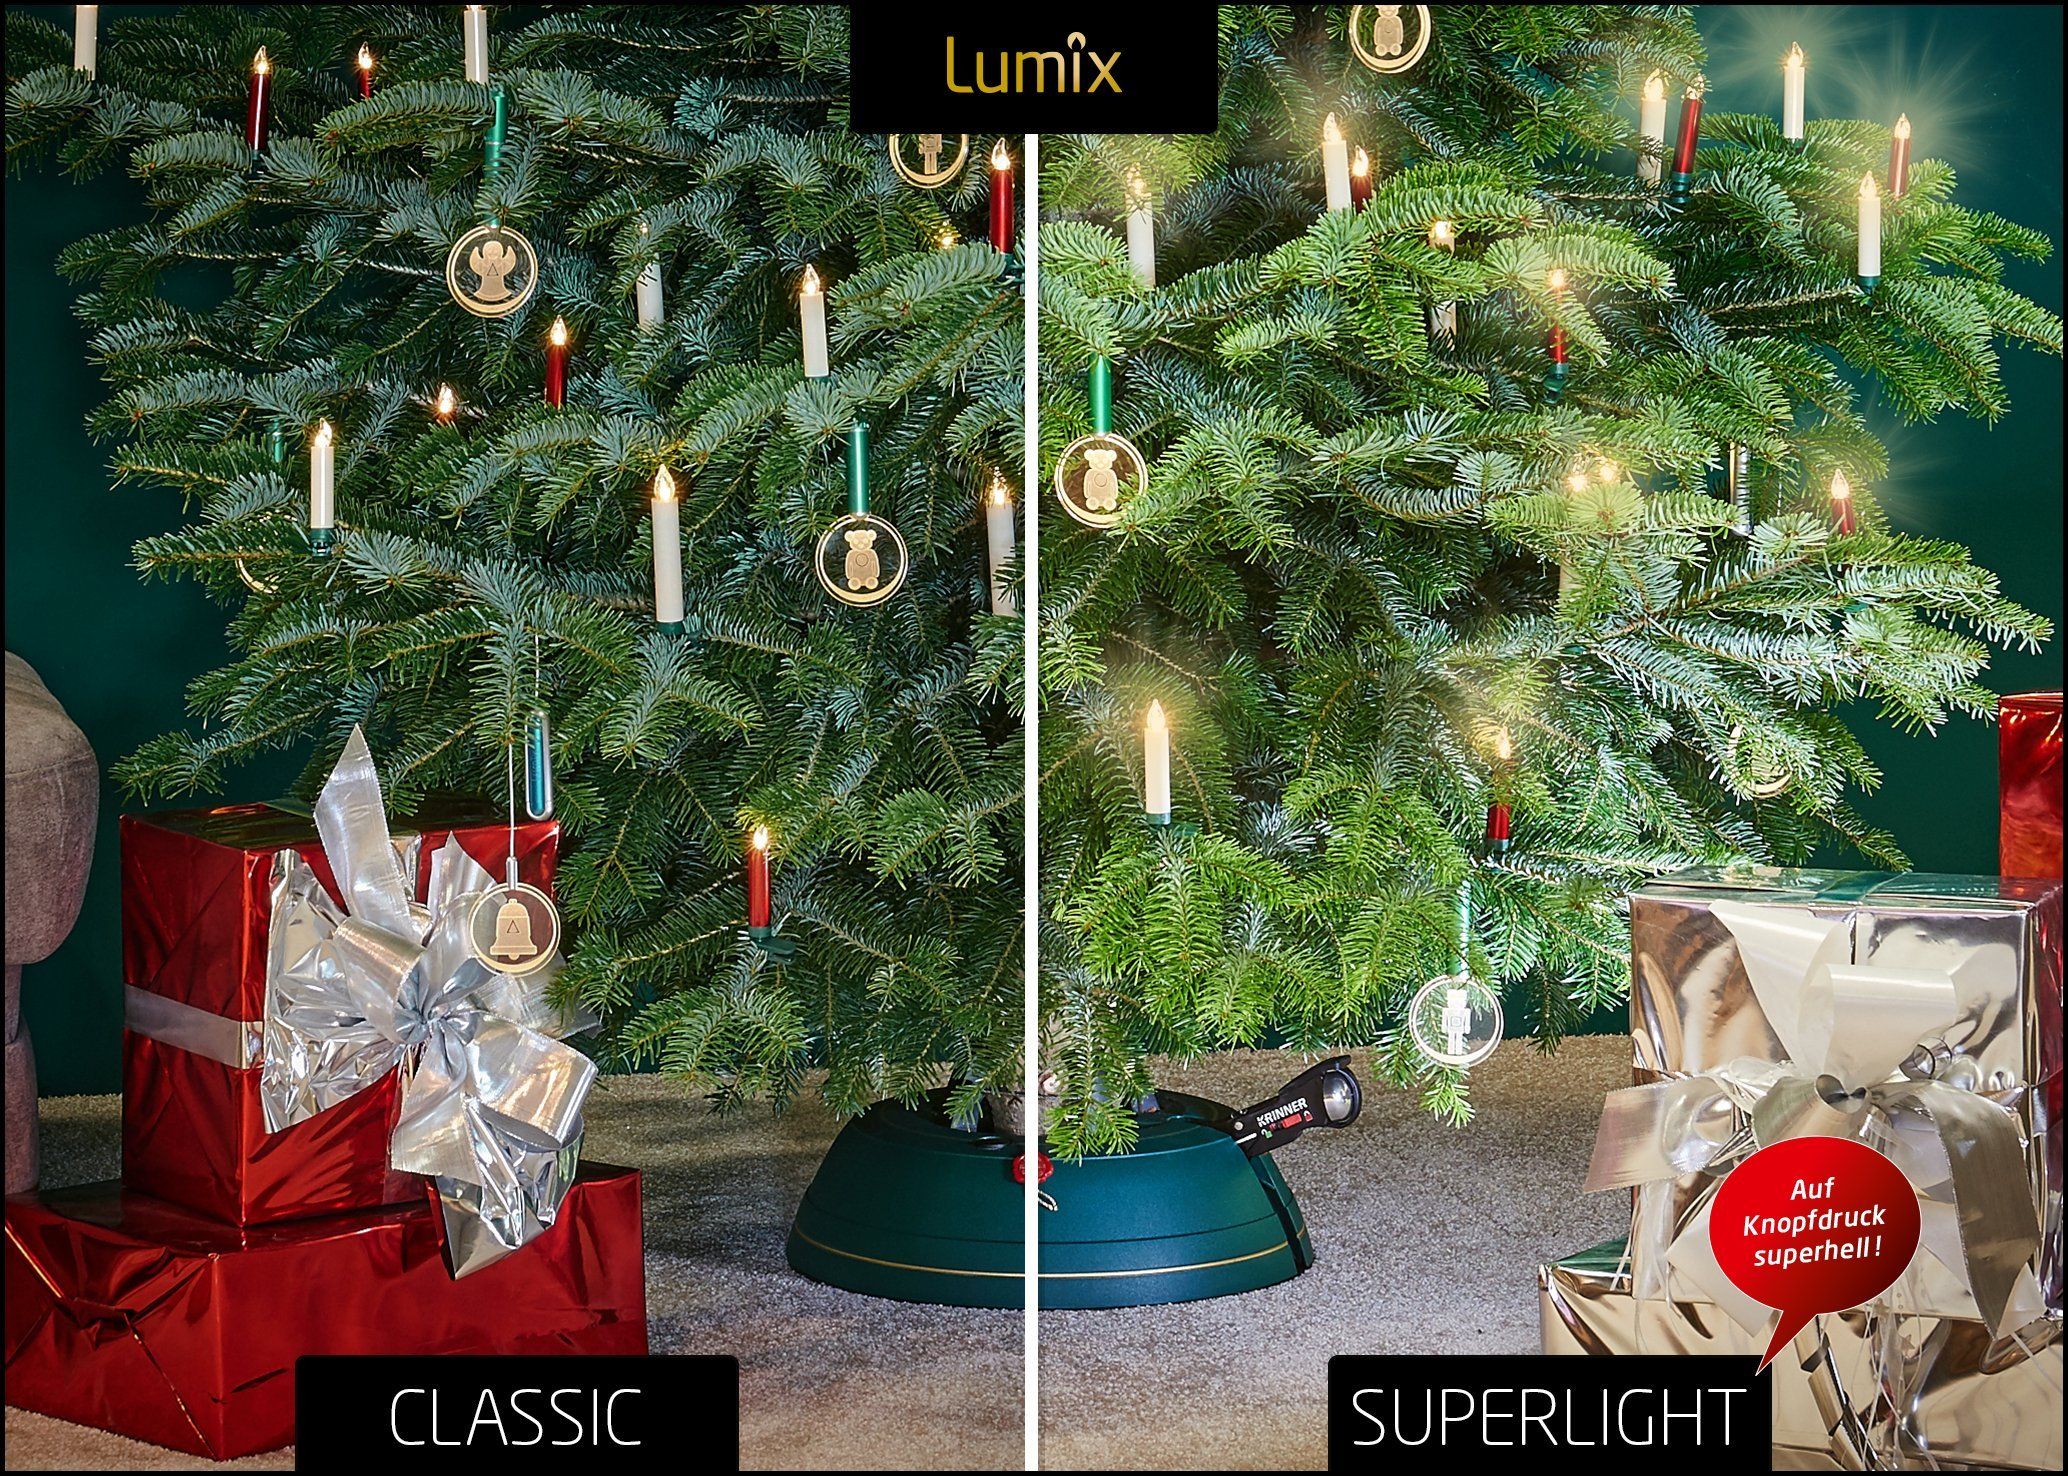 KRINNER-Lumix-Lumix-SuperLight-Crystal-kabellose-Mini-Christbaumkerzen-Basis-Set-ABS-Kunststoff-001-W-rot-15-x-15-x-9-cm